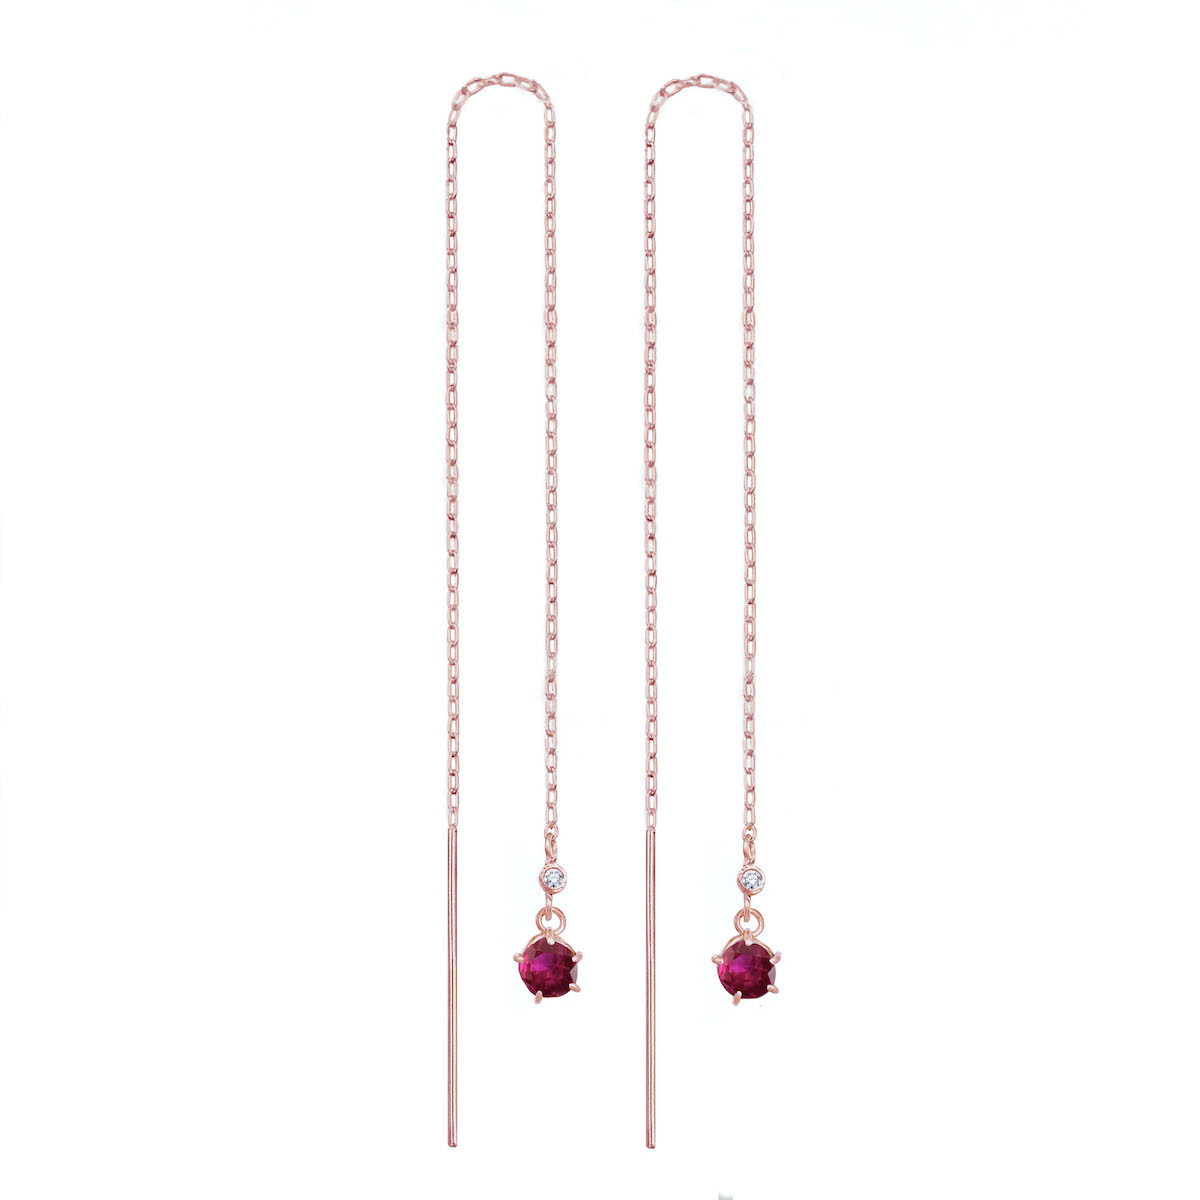 Rubye-Drop-Threader-Rose-Gold-32-3 RG